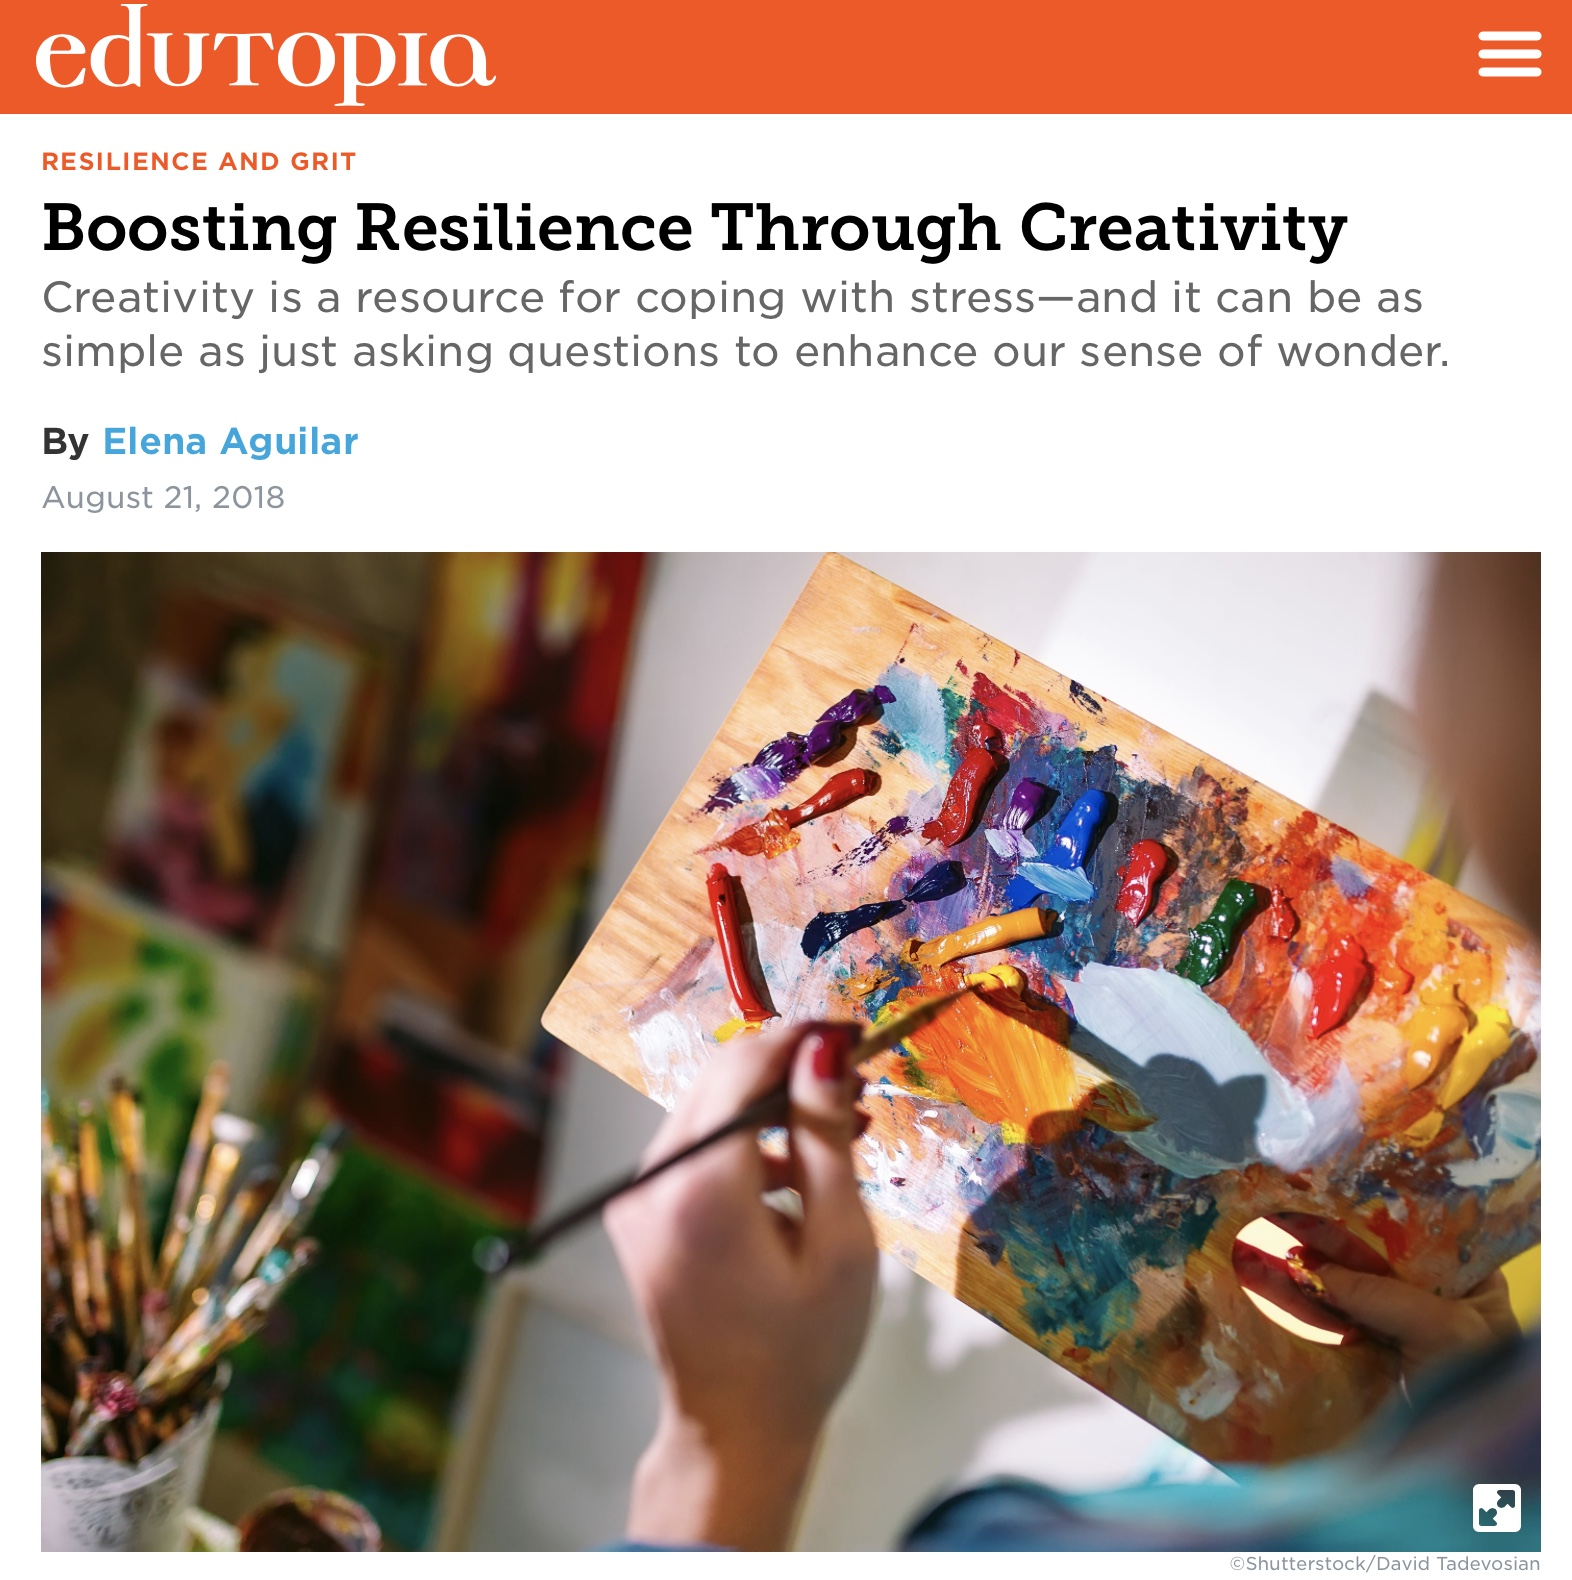 Creativity article screenshot.jpeg